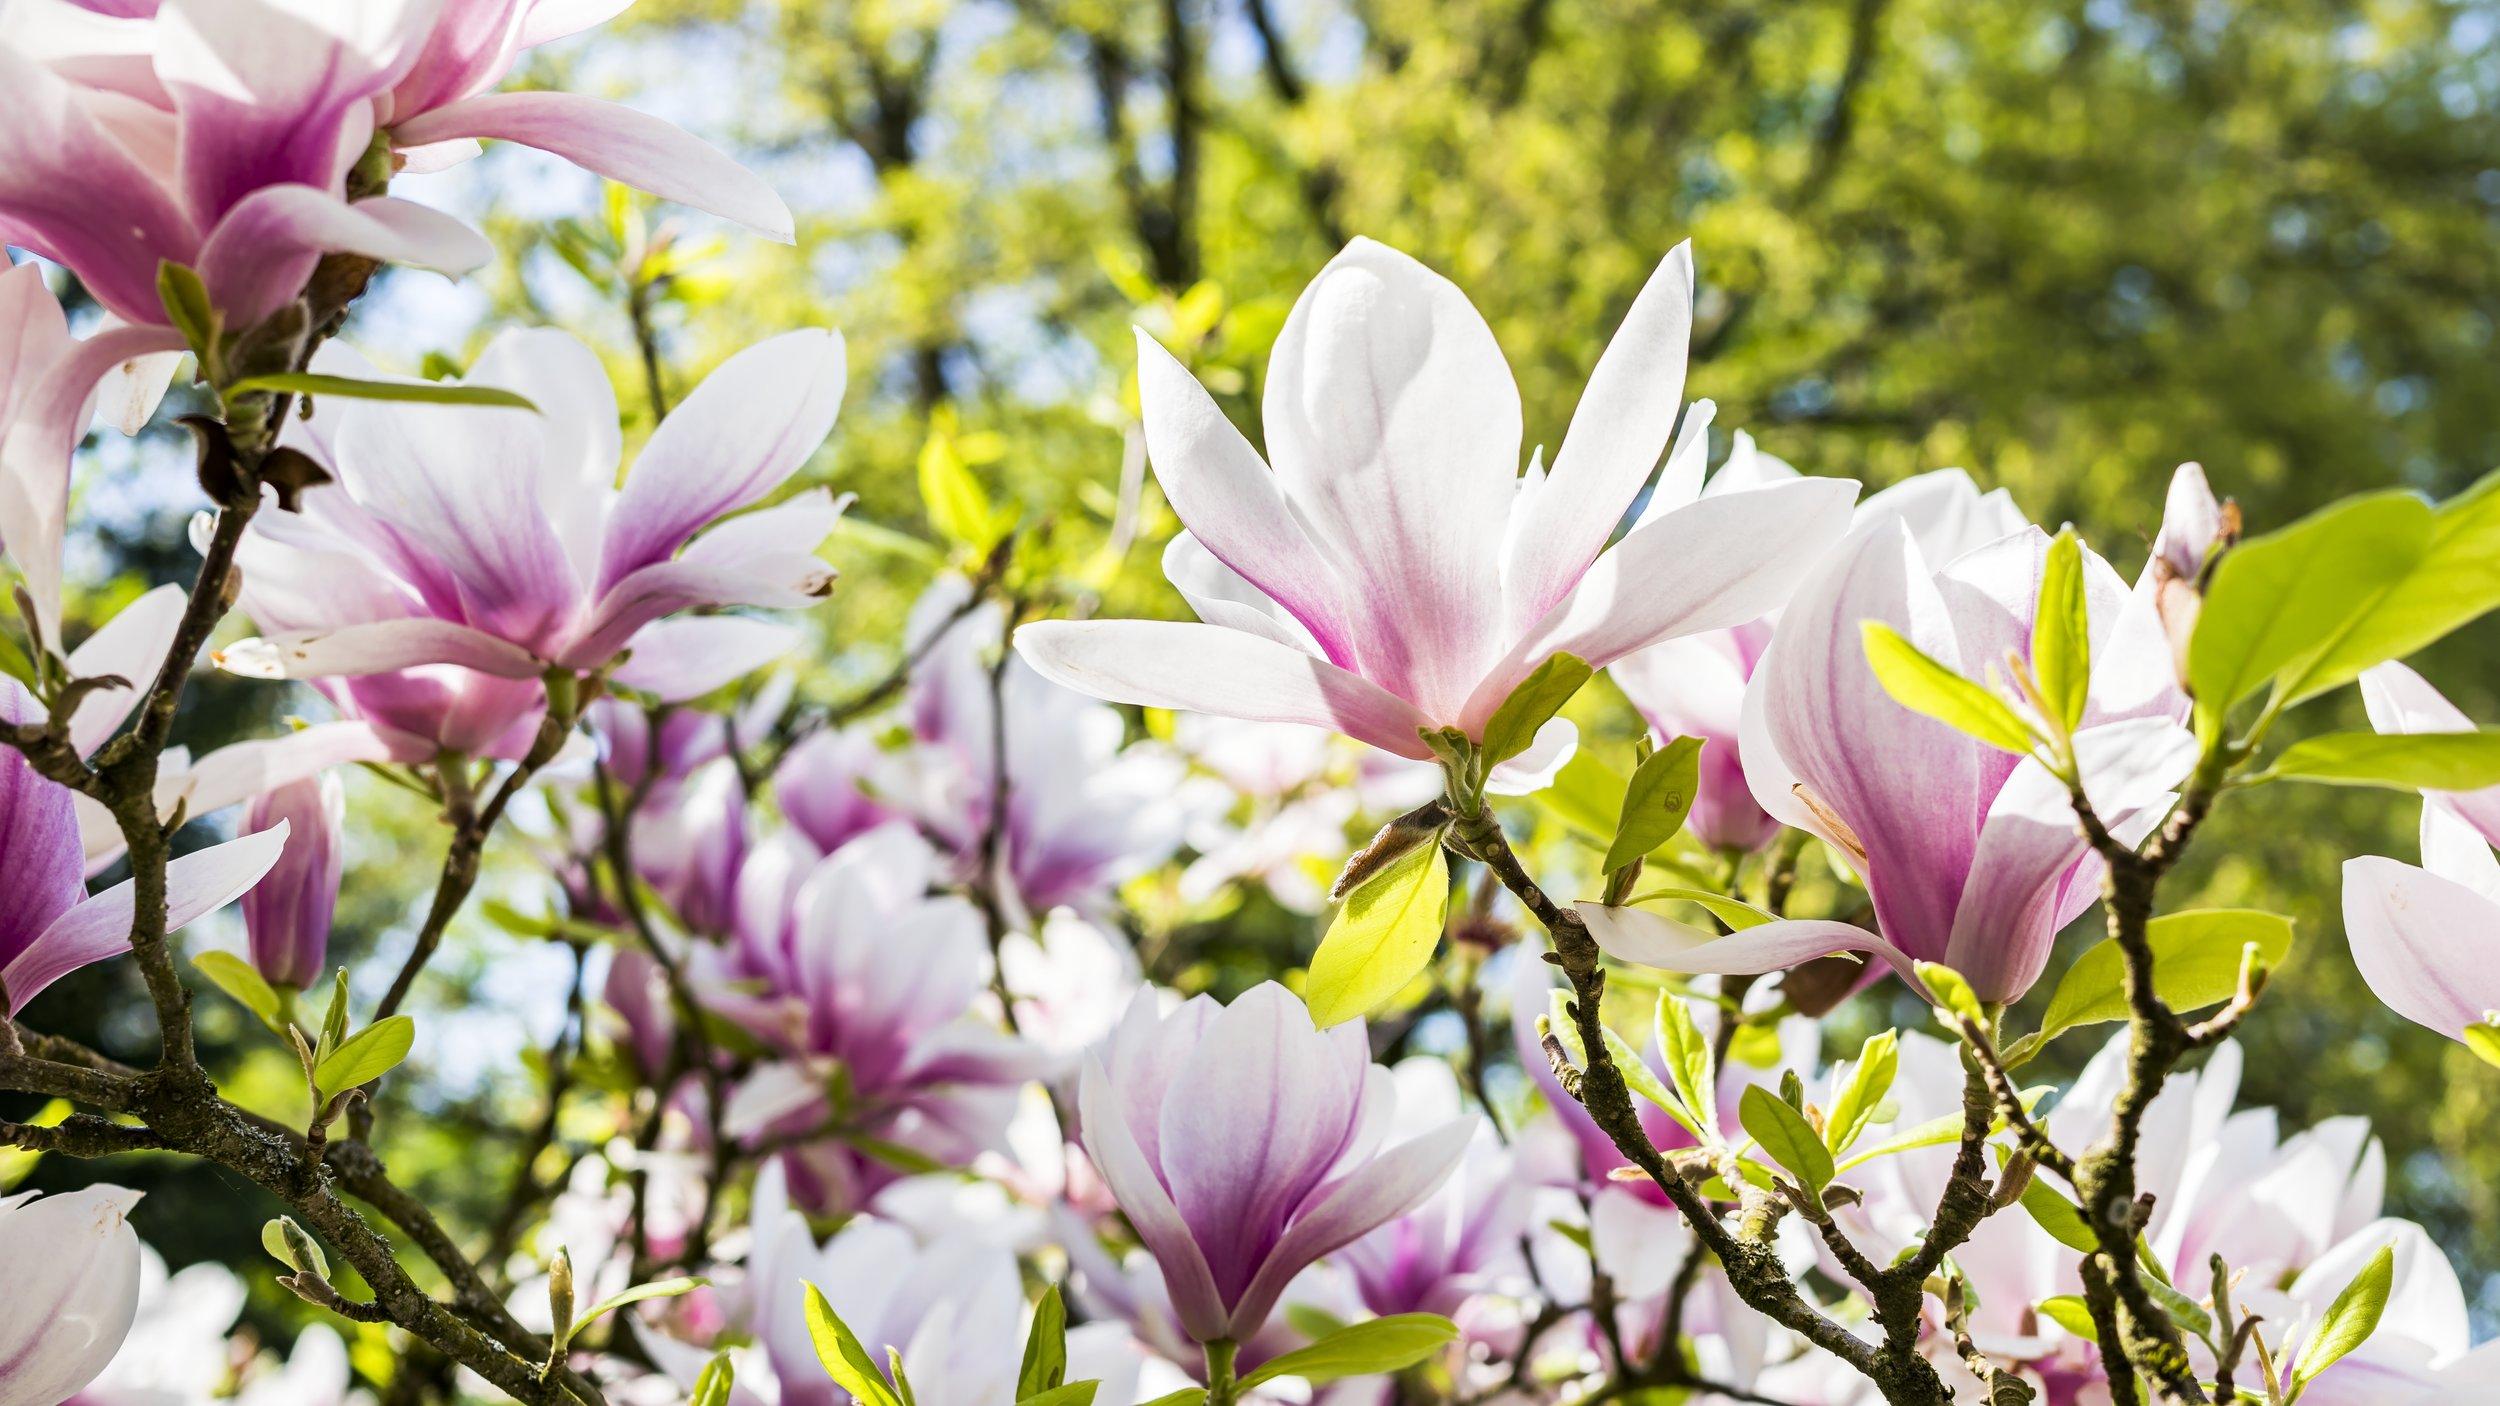 magnolia-flower-3339266.jpg